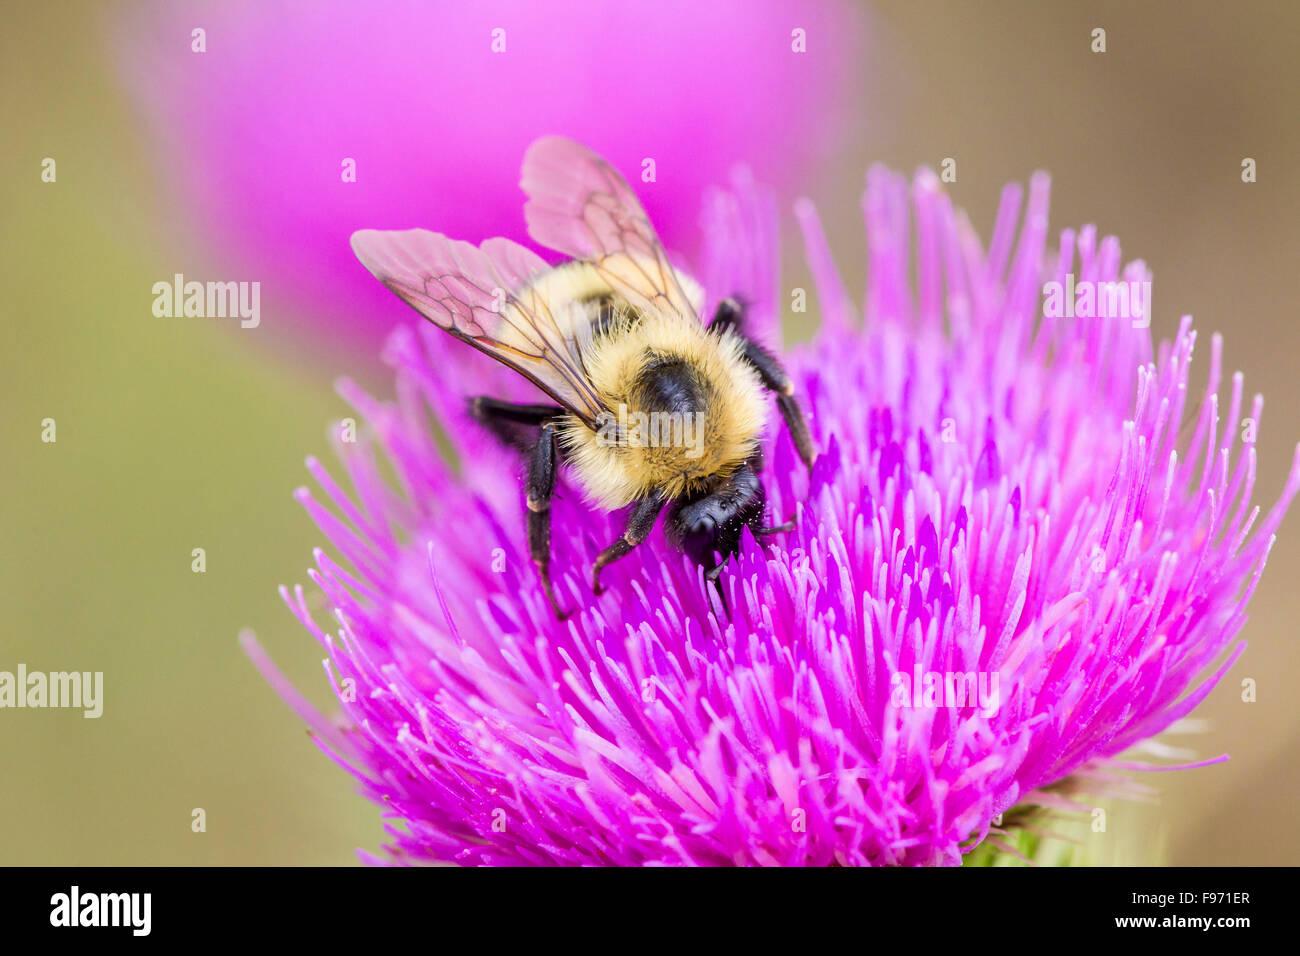 A native Bumble Bee (Bombus) on nonnative Bull Thistle (Cirsium vulgare), Manitoulin Island, Ontario - Stock Image